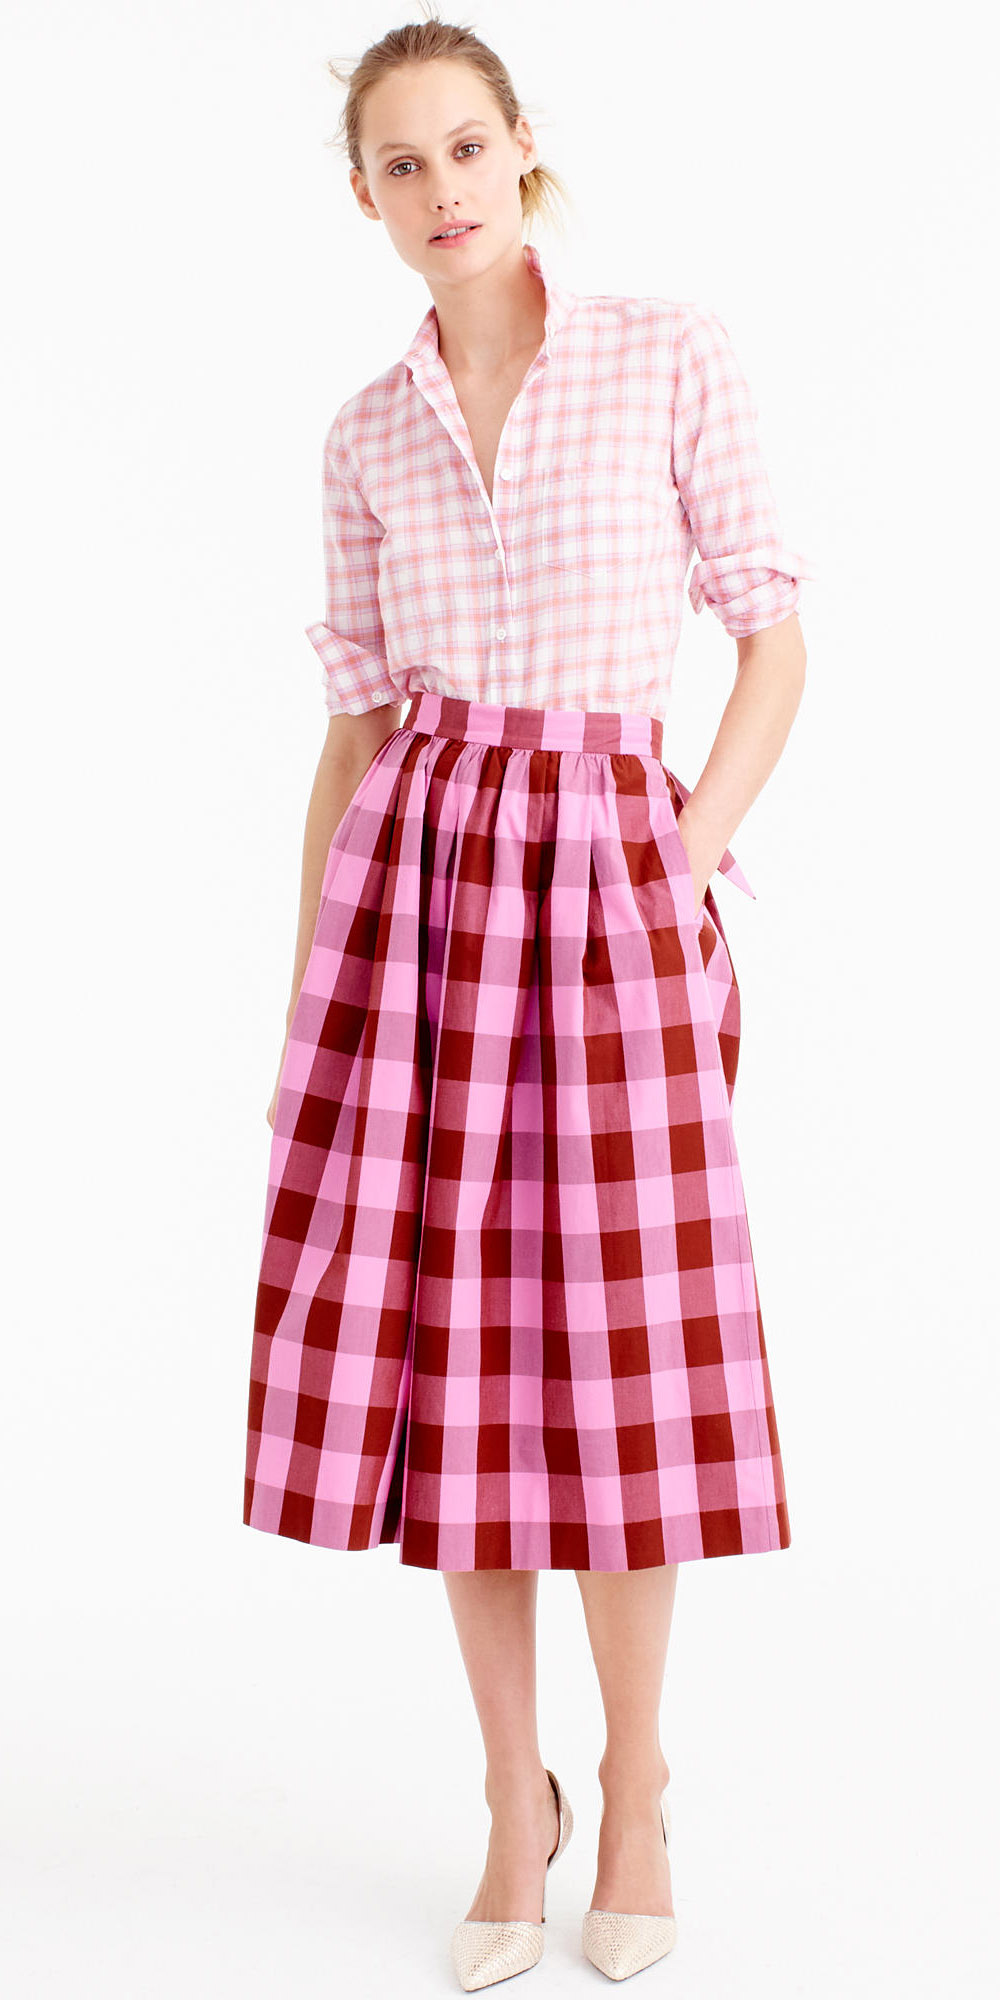 pink-magenta-midi-skirt-gingham-print-pink-light-collared-shirt-bun-blonde-spring-summer-lunch.jpg